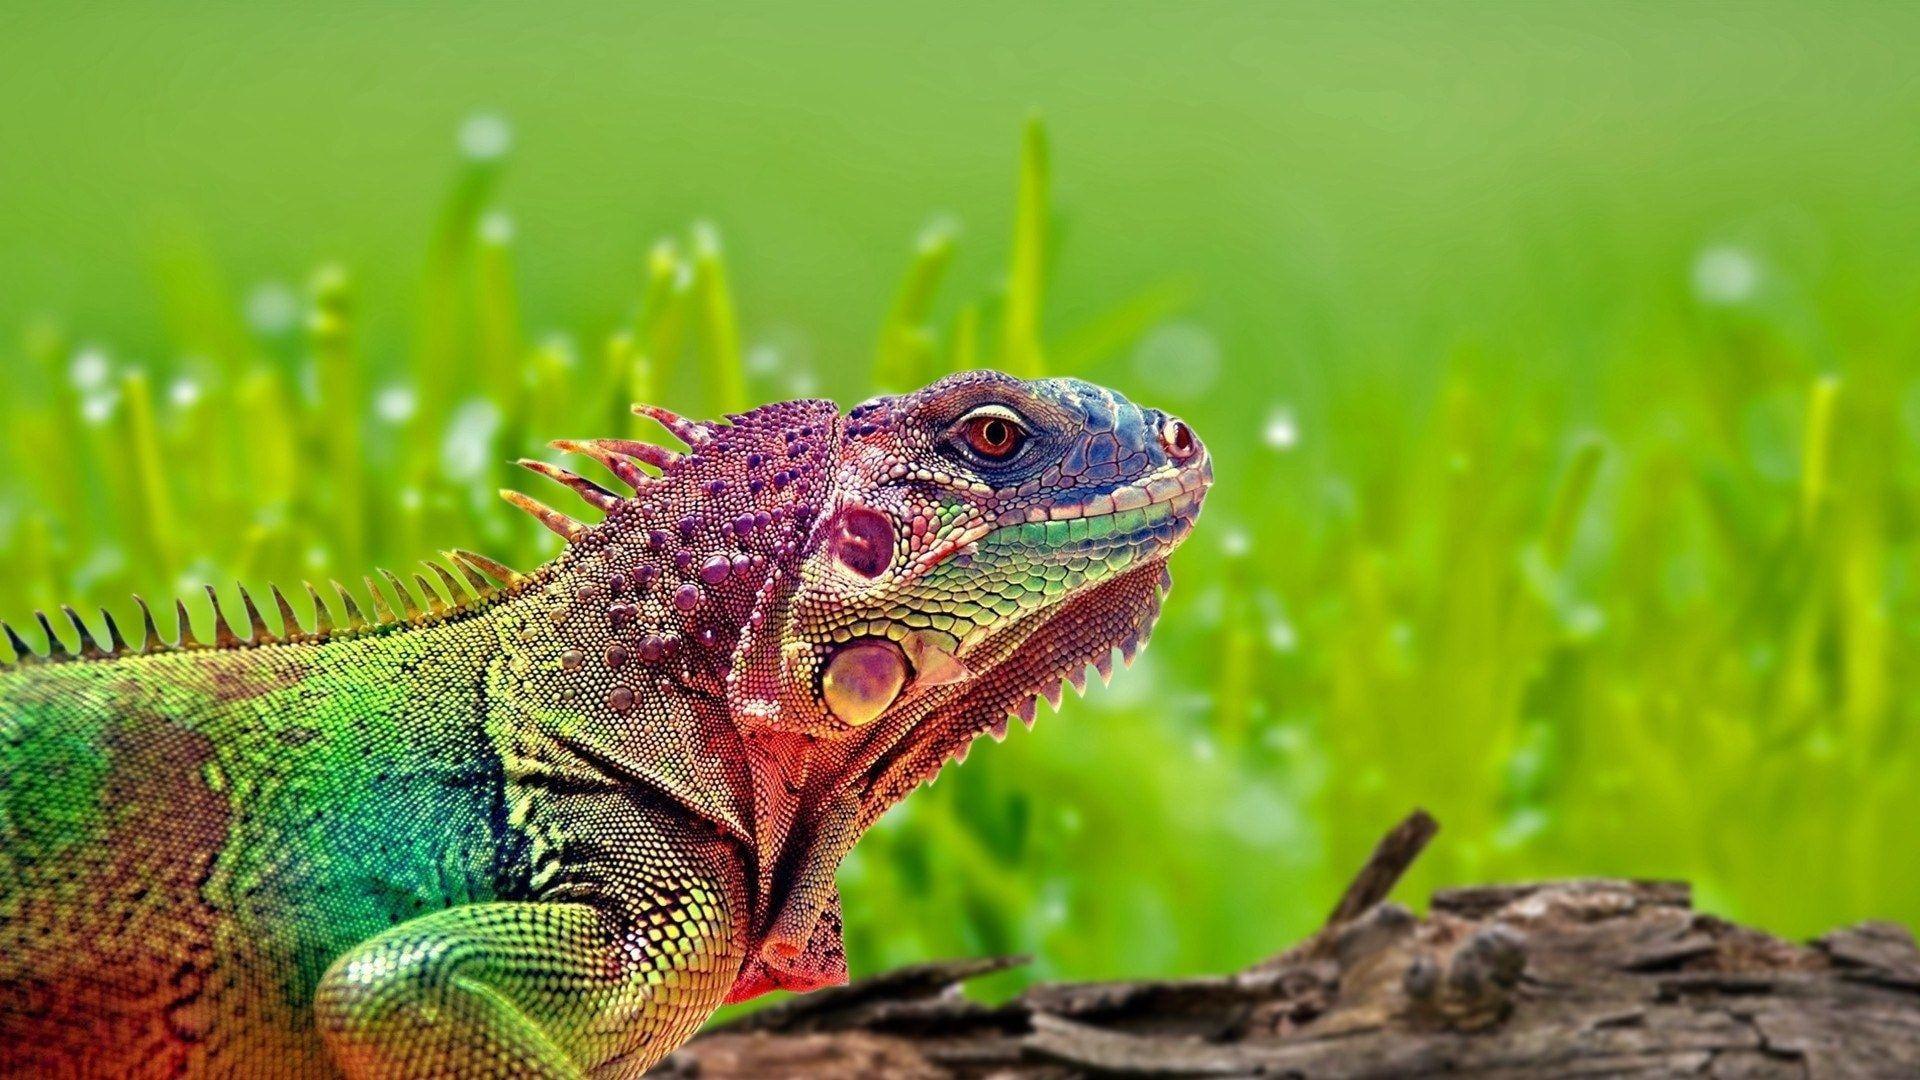 reptiles colorful grass iguana animals 1080P